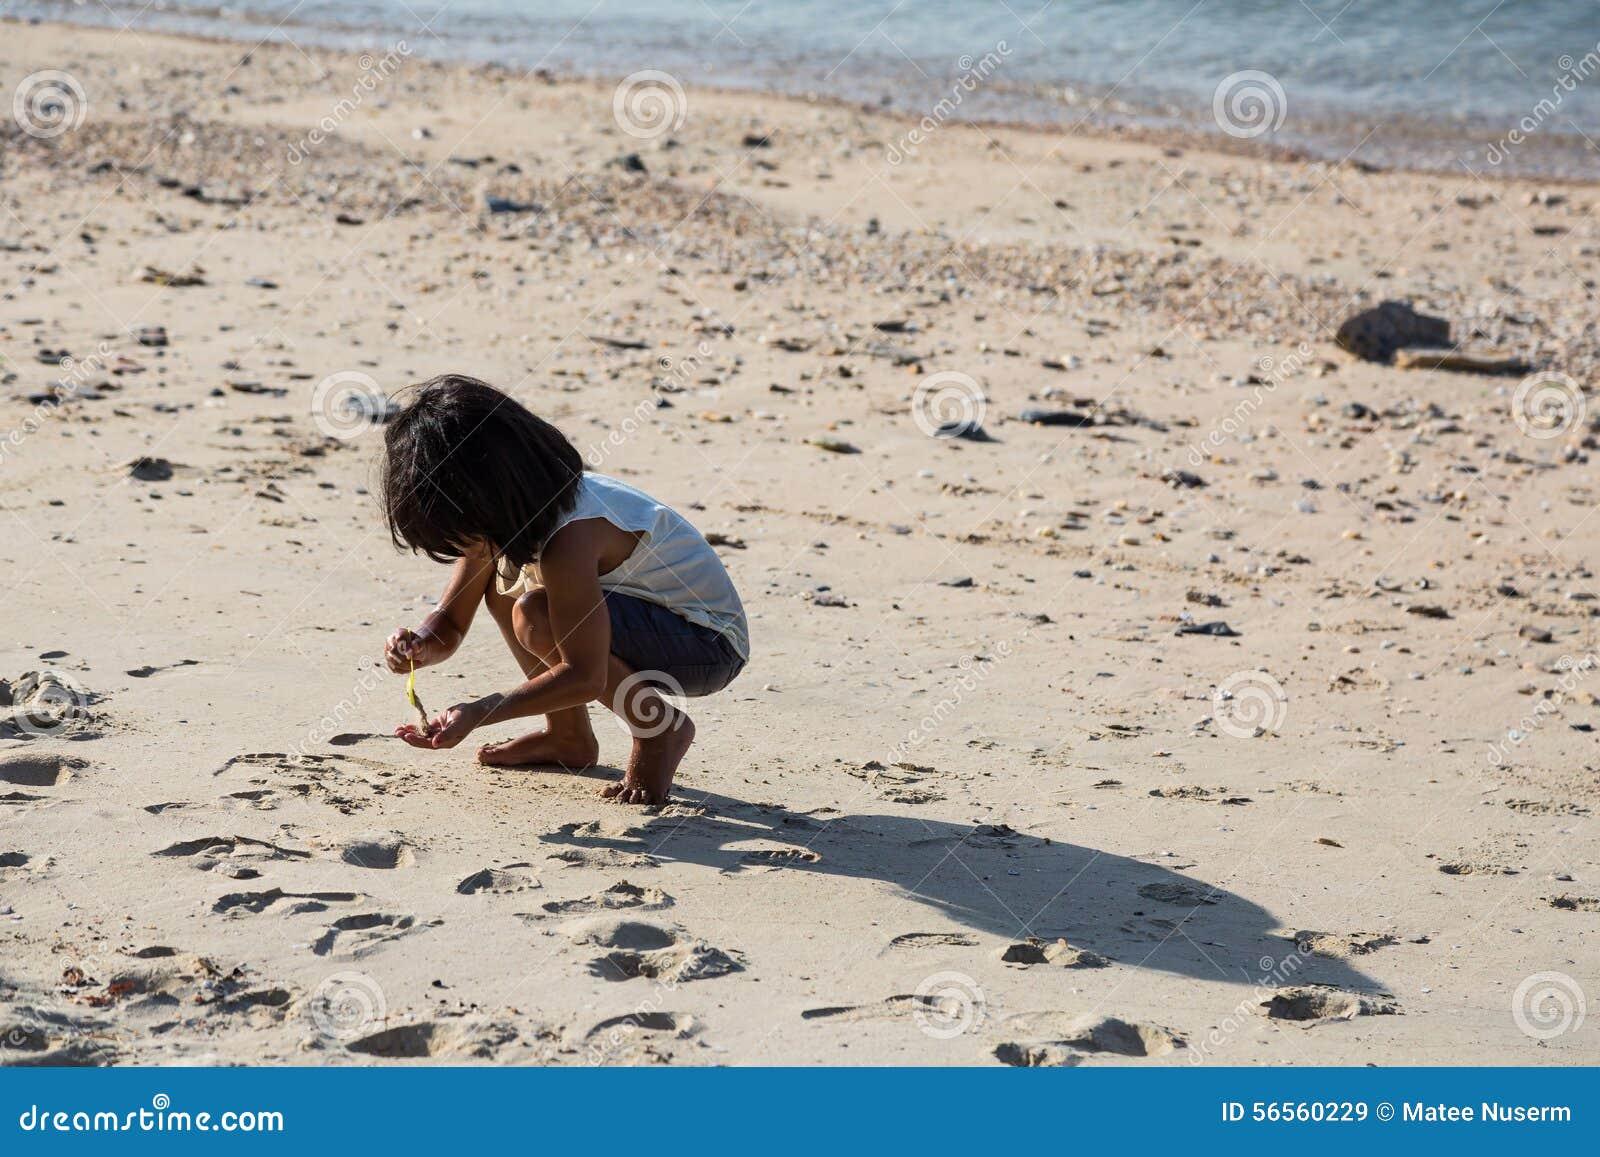 Download Το κορίτσι έχει τη διασκέδαση μόνο Εκδοτική Στοκ Εικόνα - εικόνα από καλοκαίρι, ταϊλάνδη: 56560229